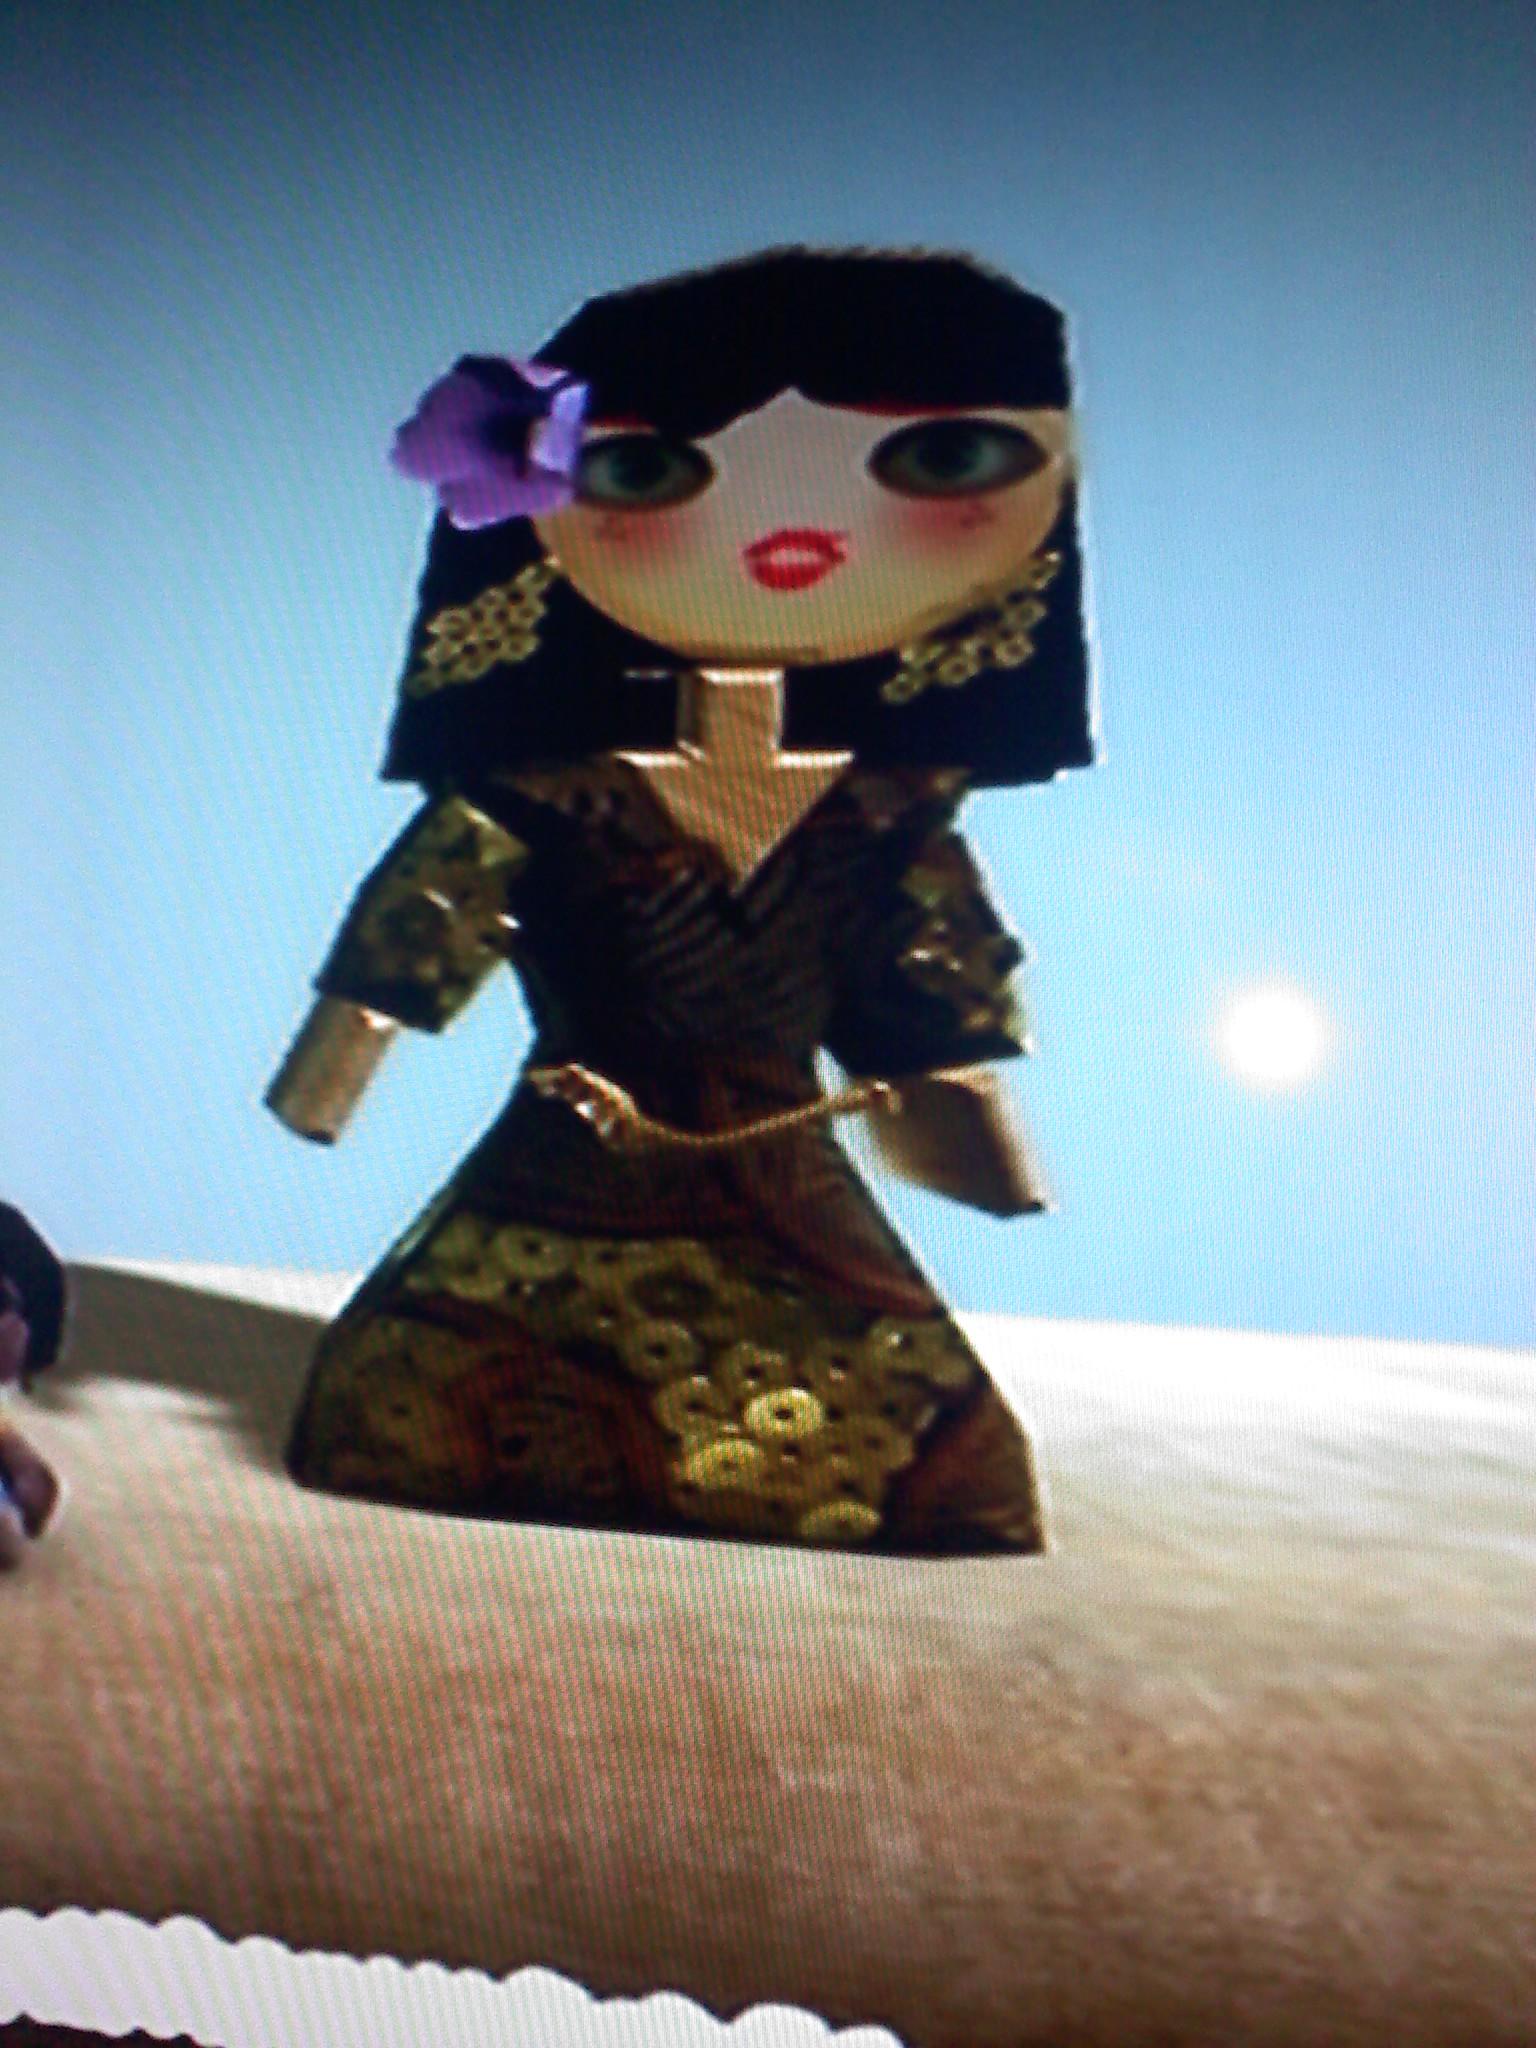 LittleBigPlanet Esmeralda image picture